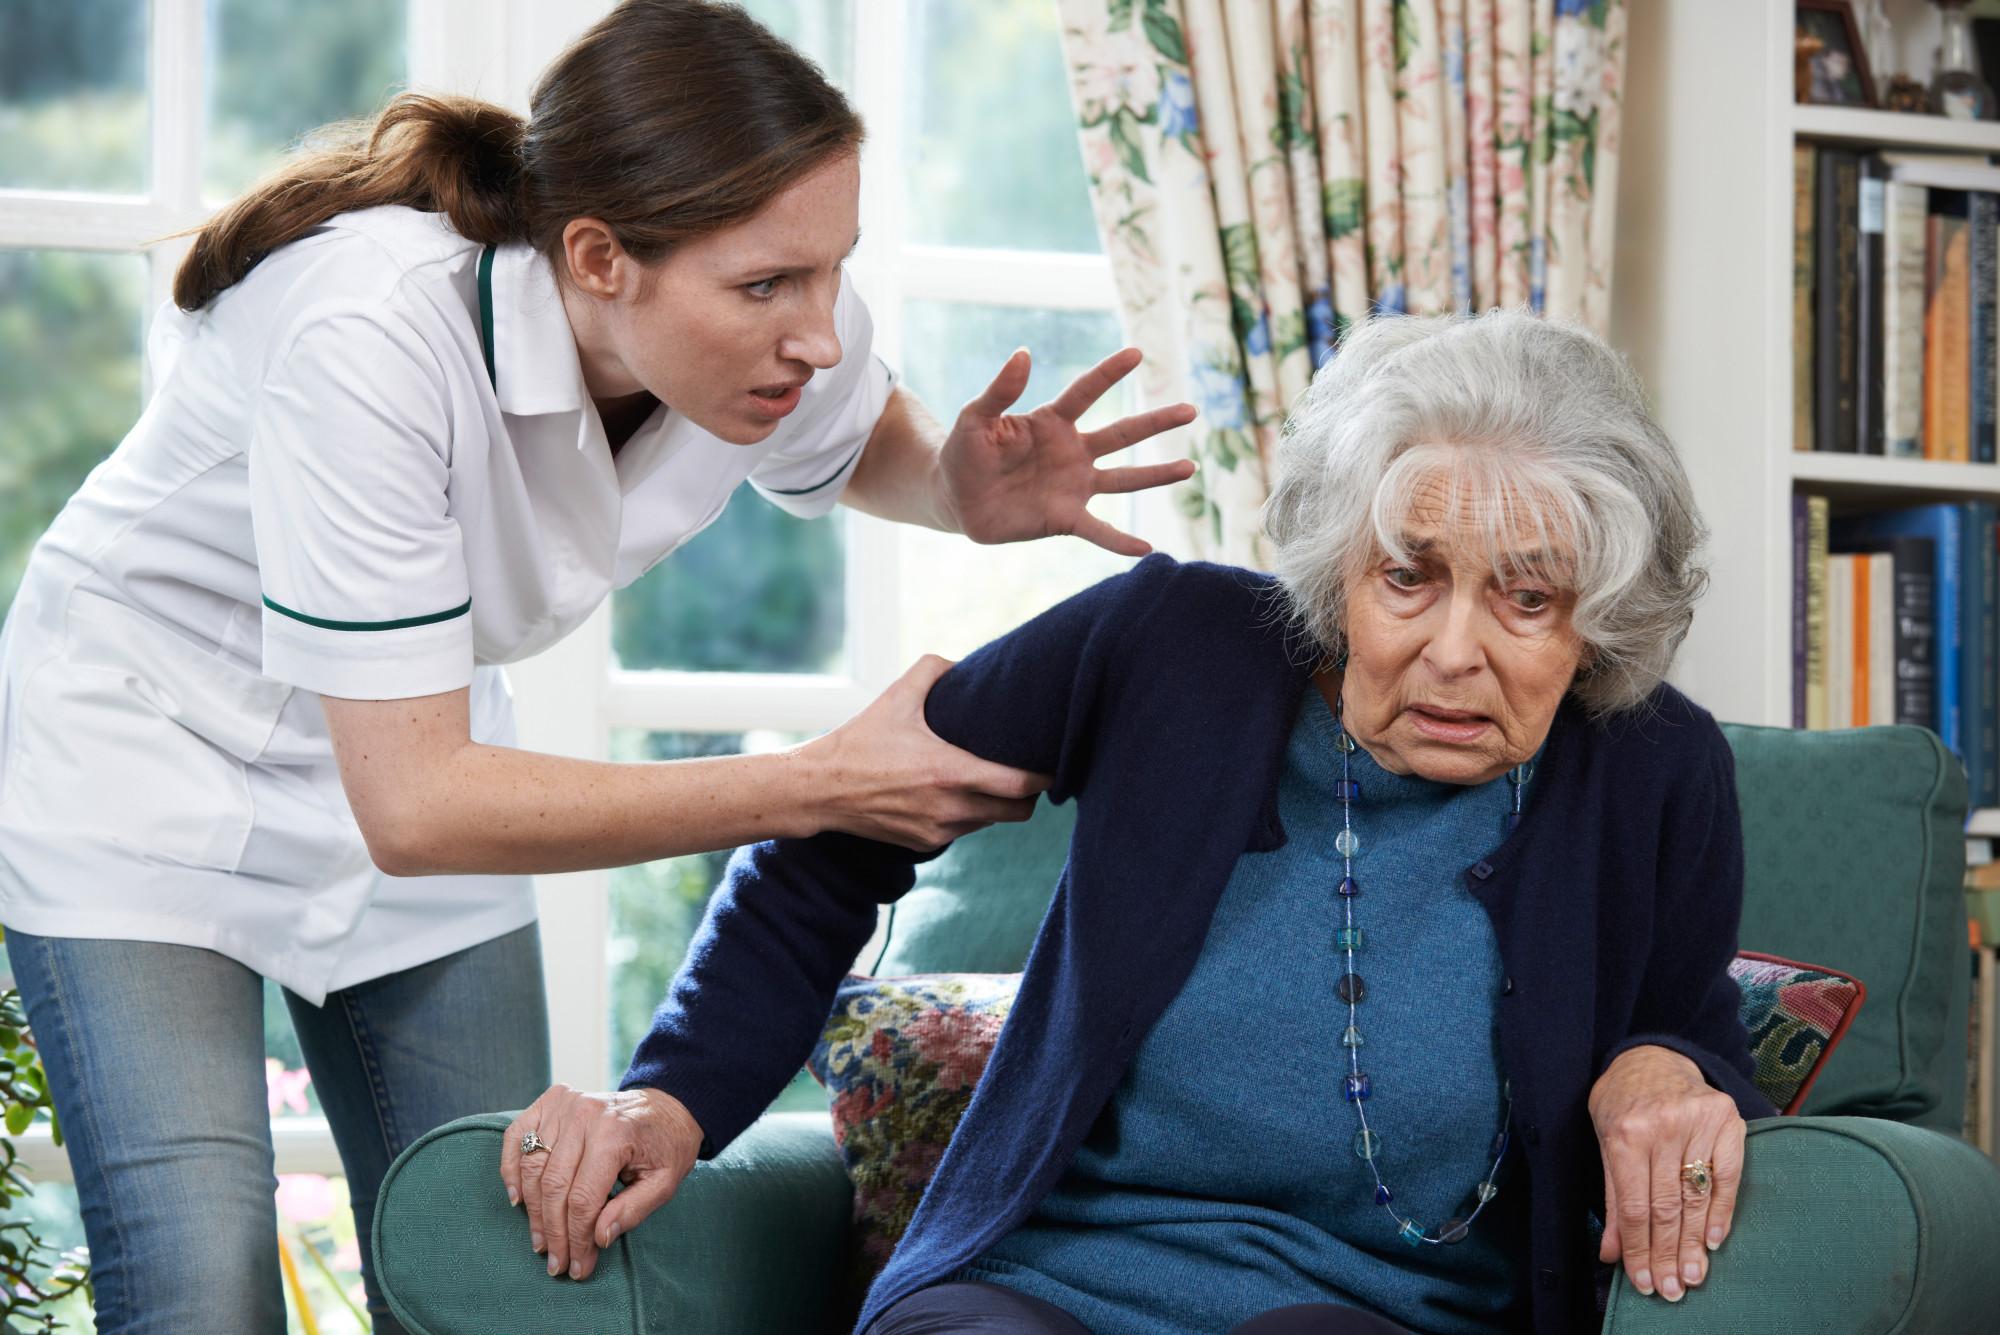 nursing home staff mistreating elderly woman